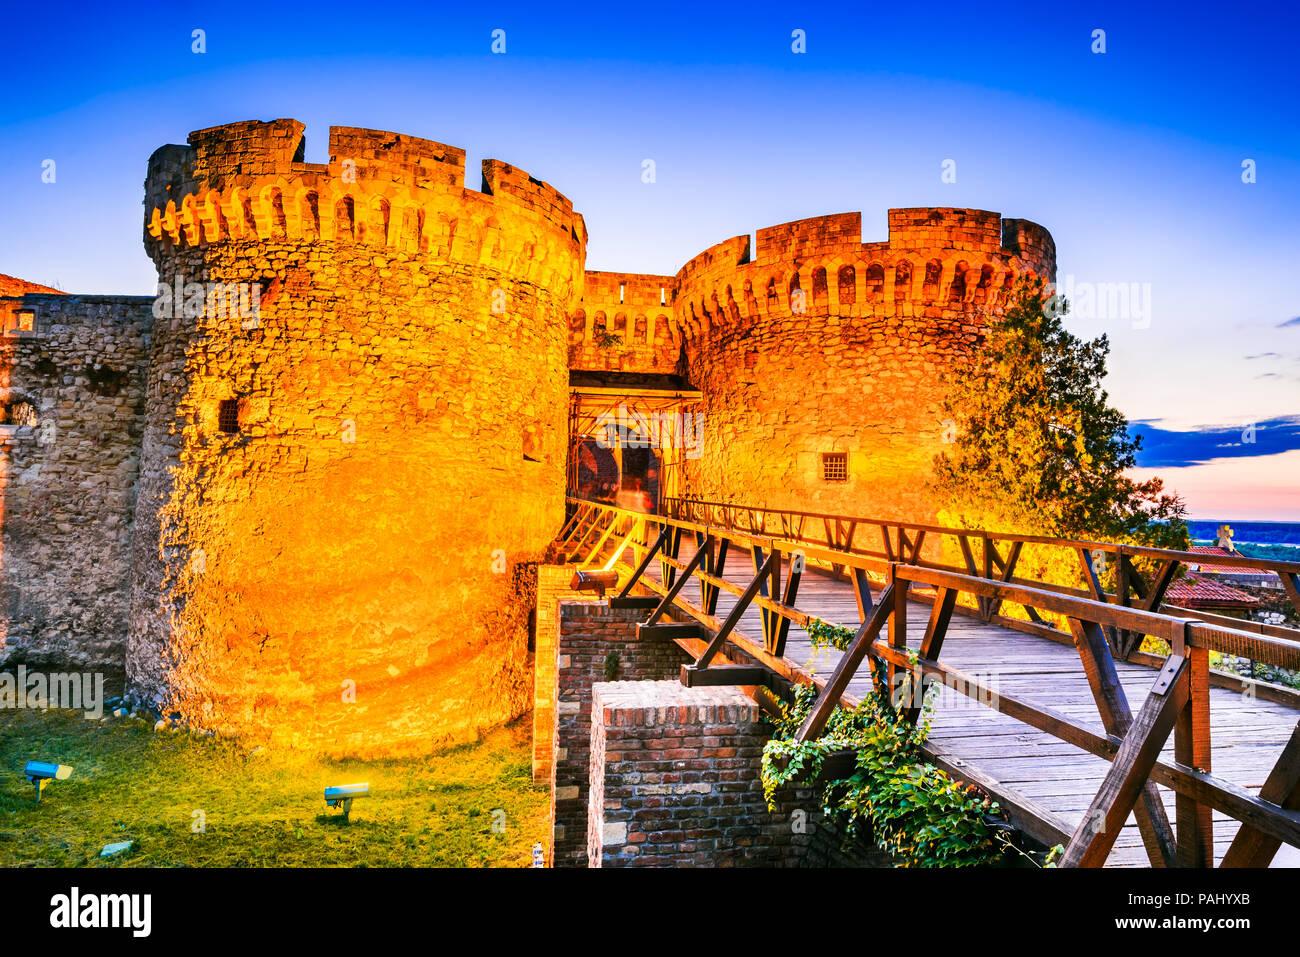 Belgrade, Serbia. Kalemegdan Fortress in the night, ancient Singidunum. - Stock Image